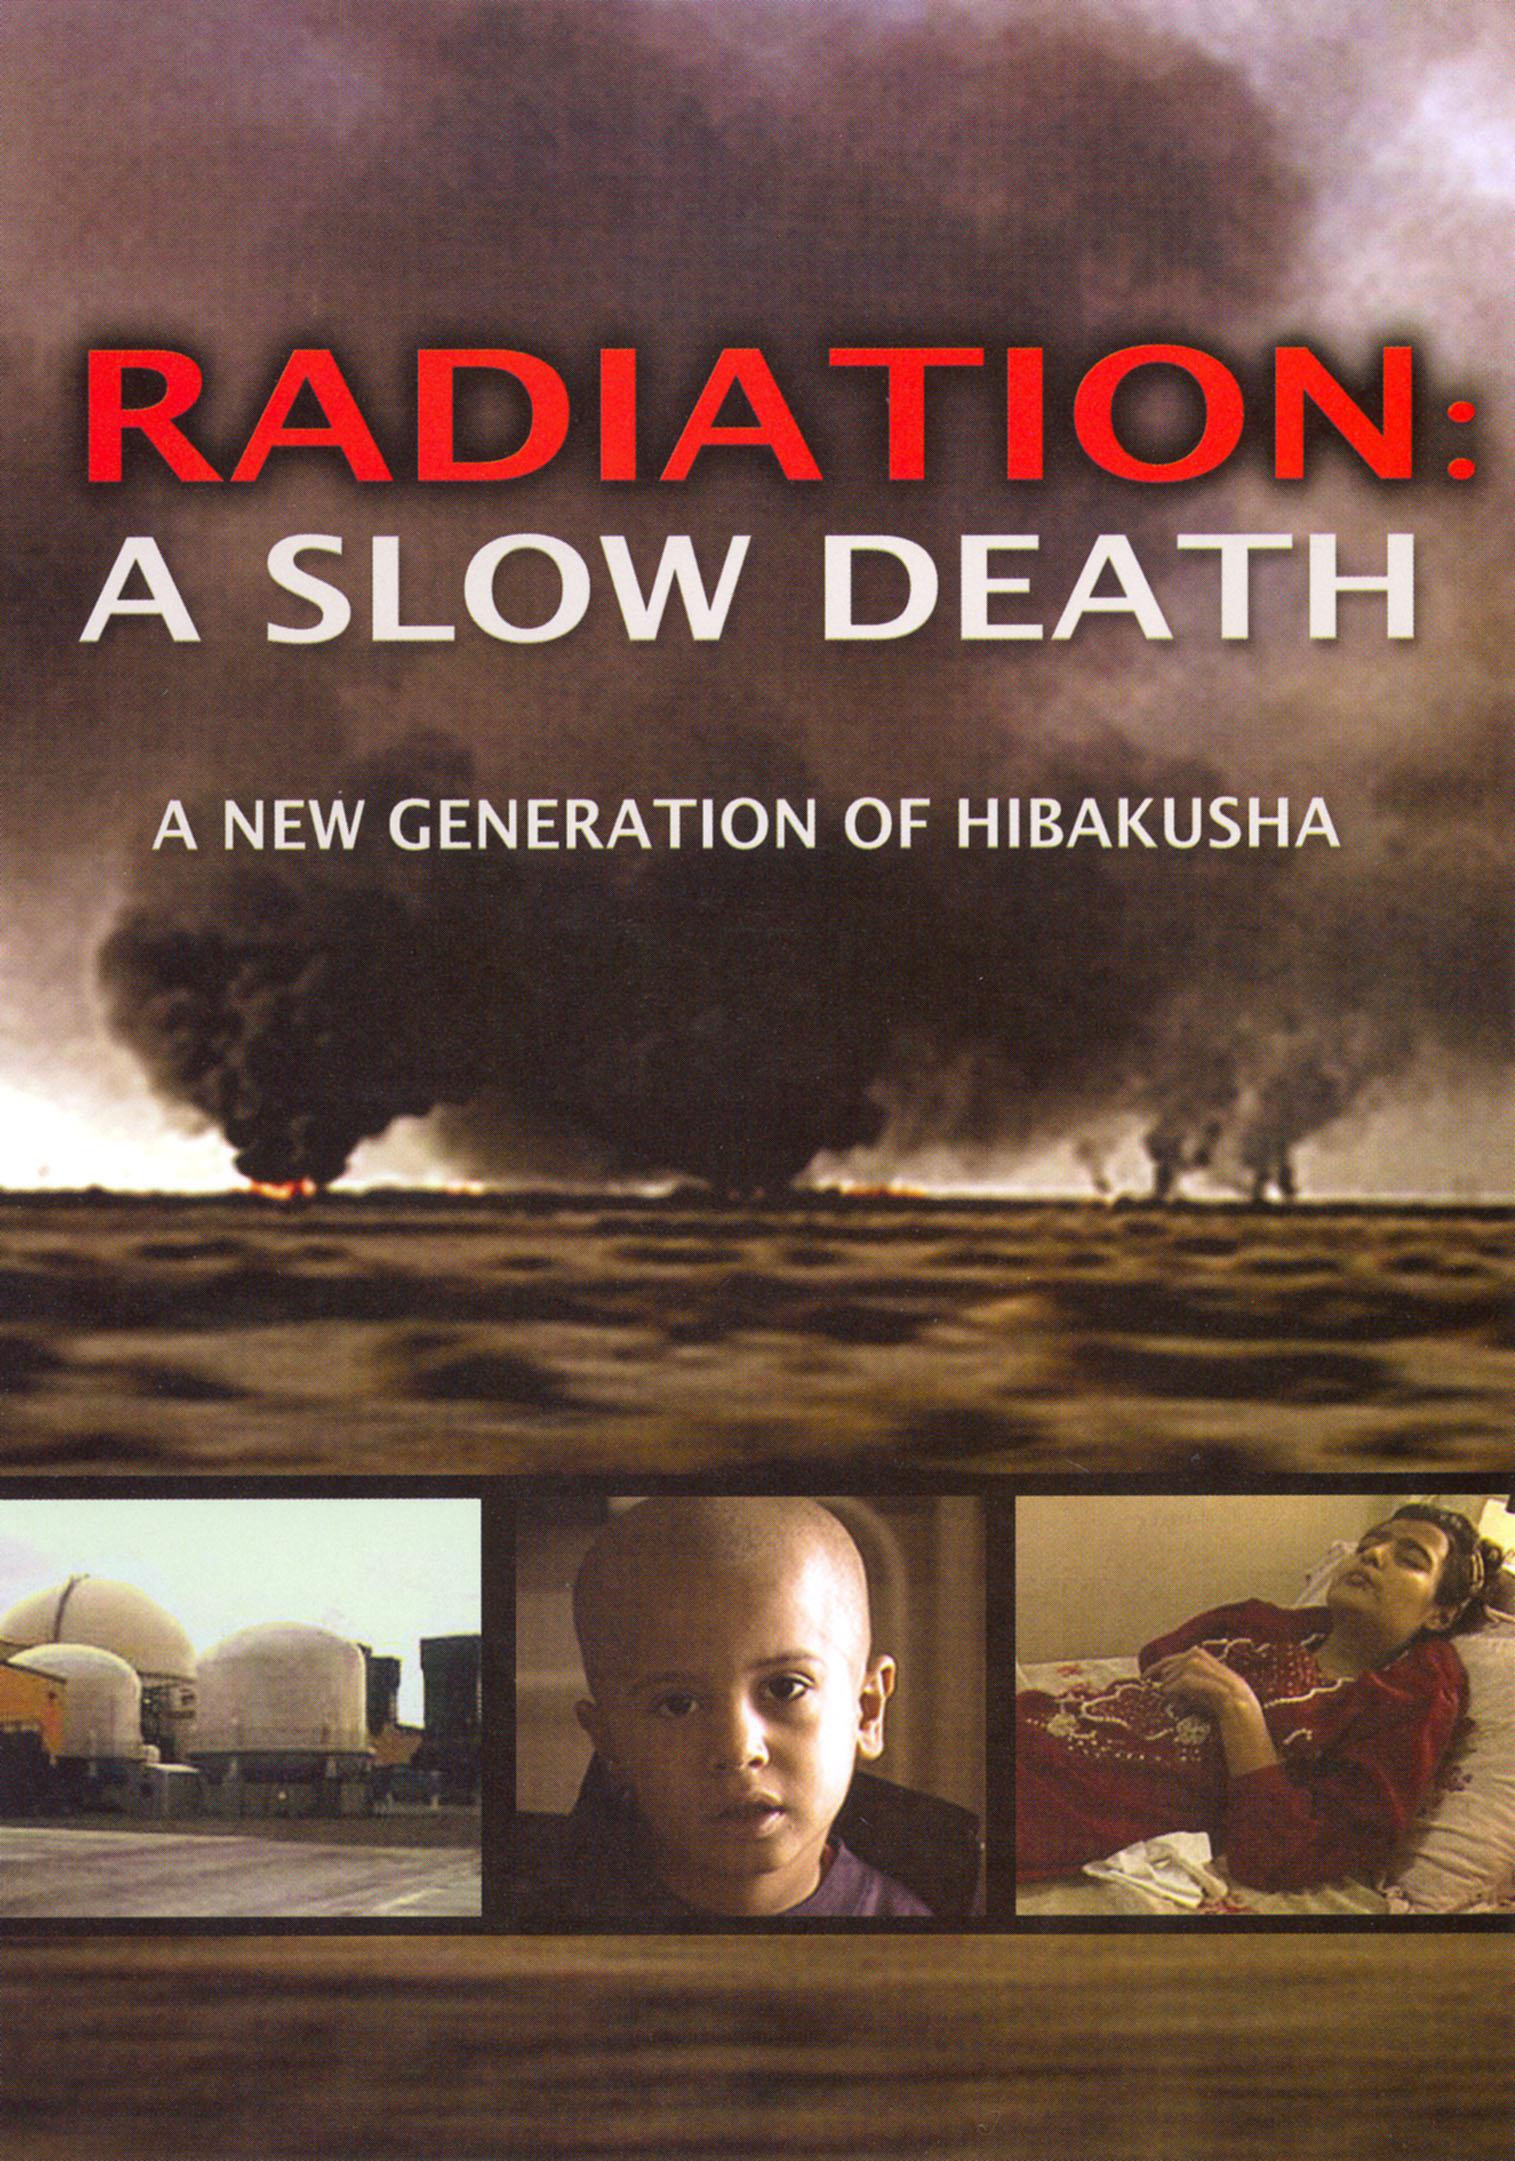 Radiation: A Slow Death - A New Generation of Hibakusha